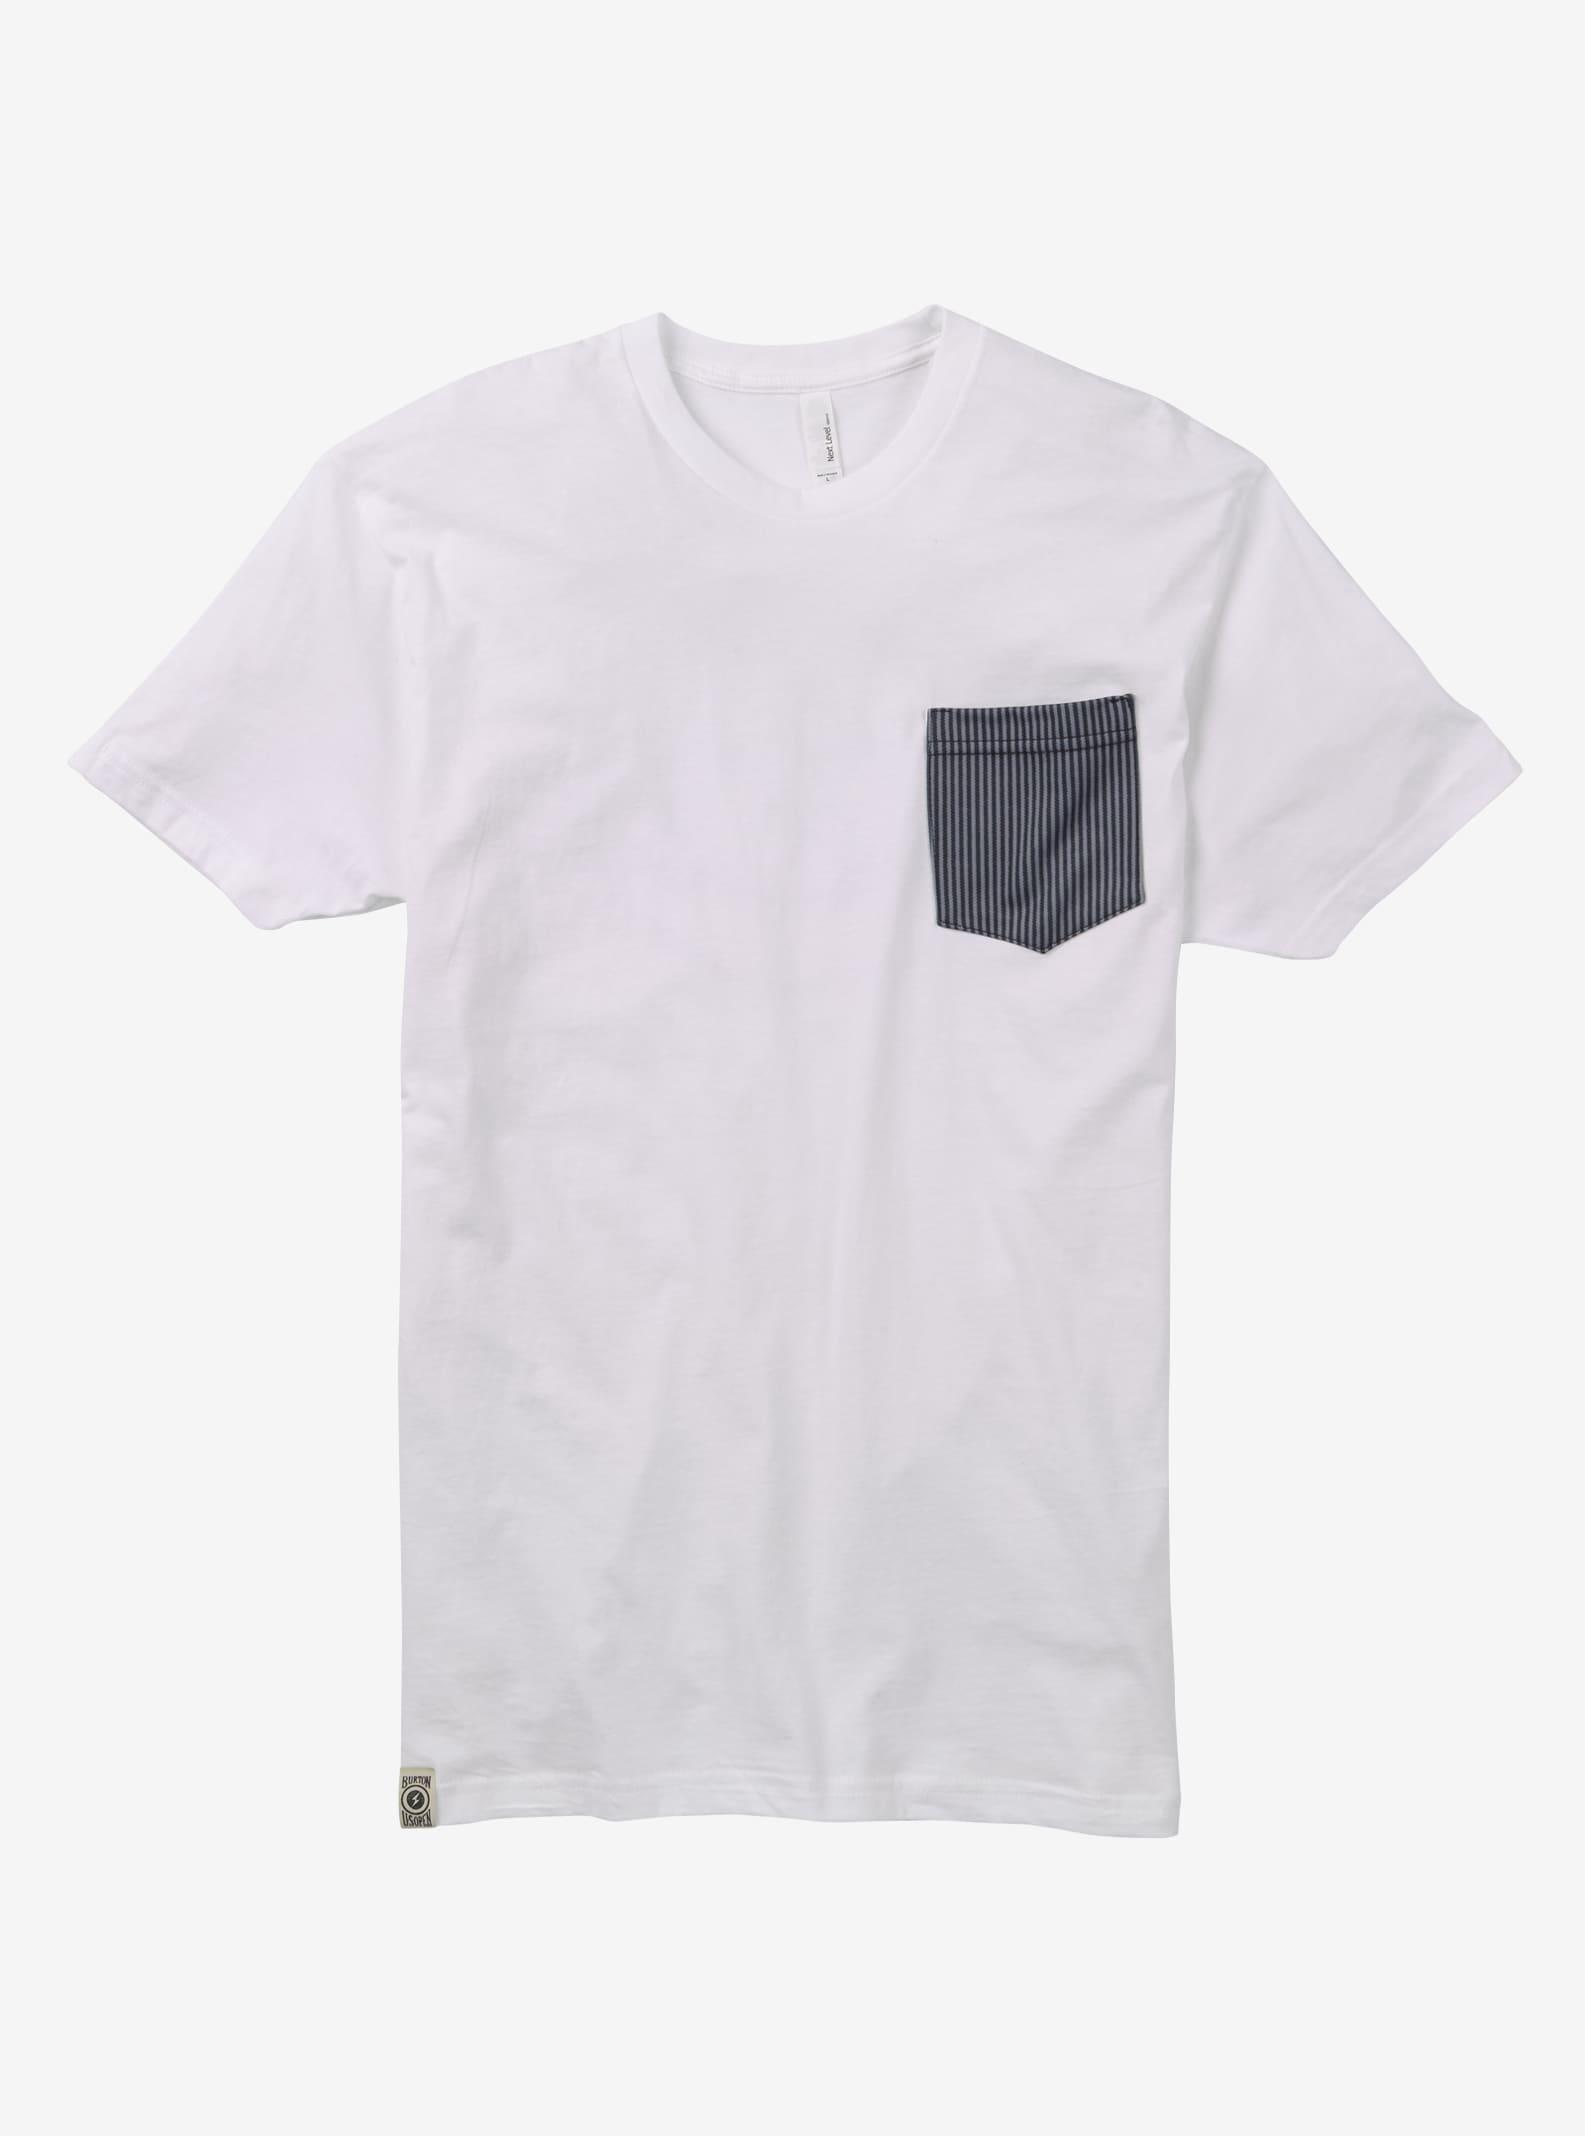 Burton US Open Bolt Short Sleeve T Shirt shown in White